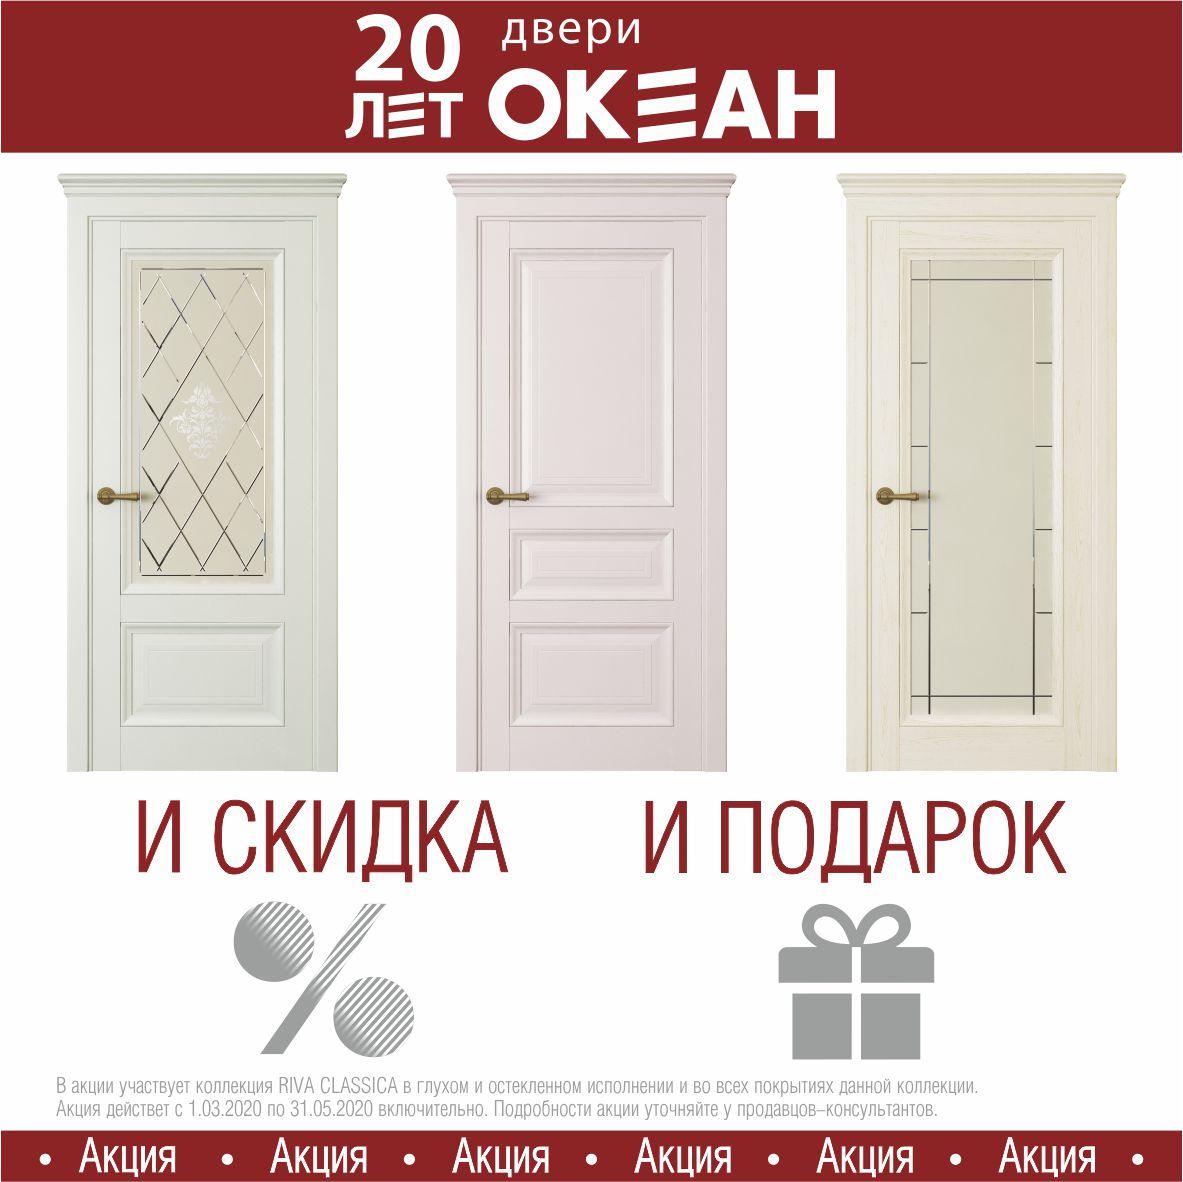 Скидки и акции на ульяновские белые двери Океан Riva Classica фото март 2020 год